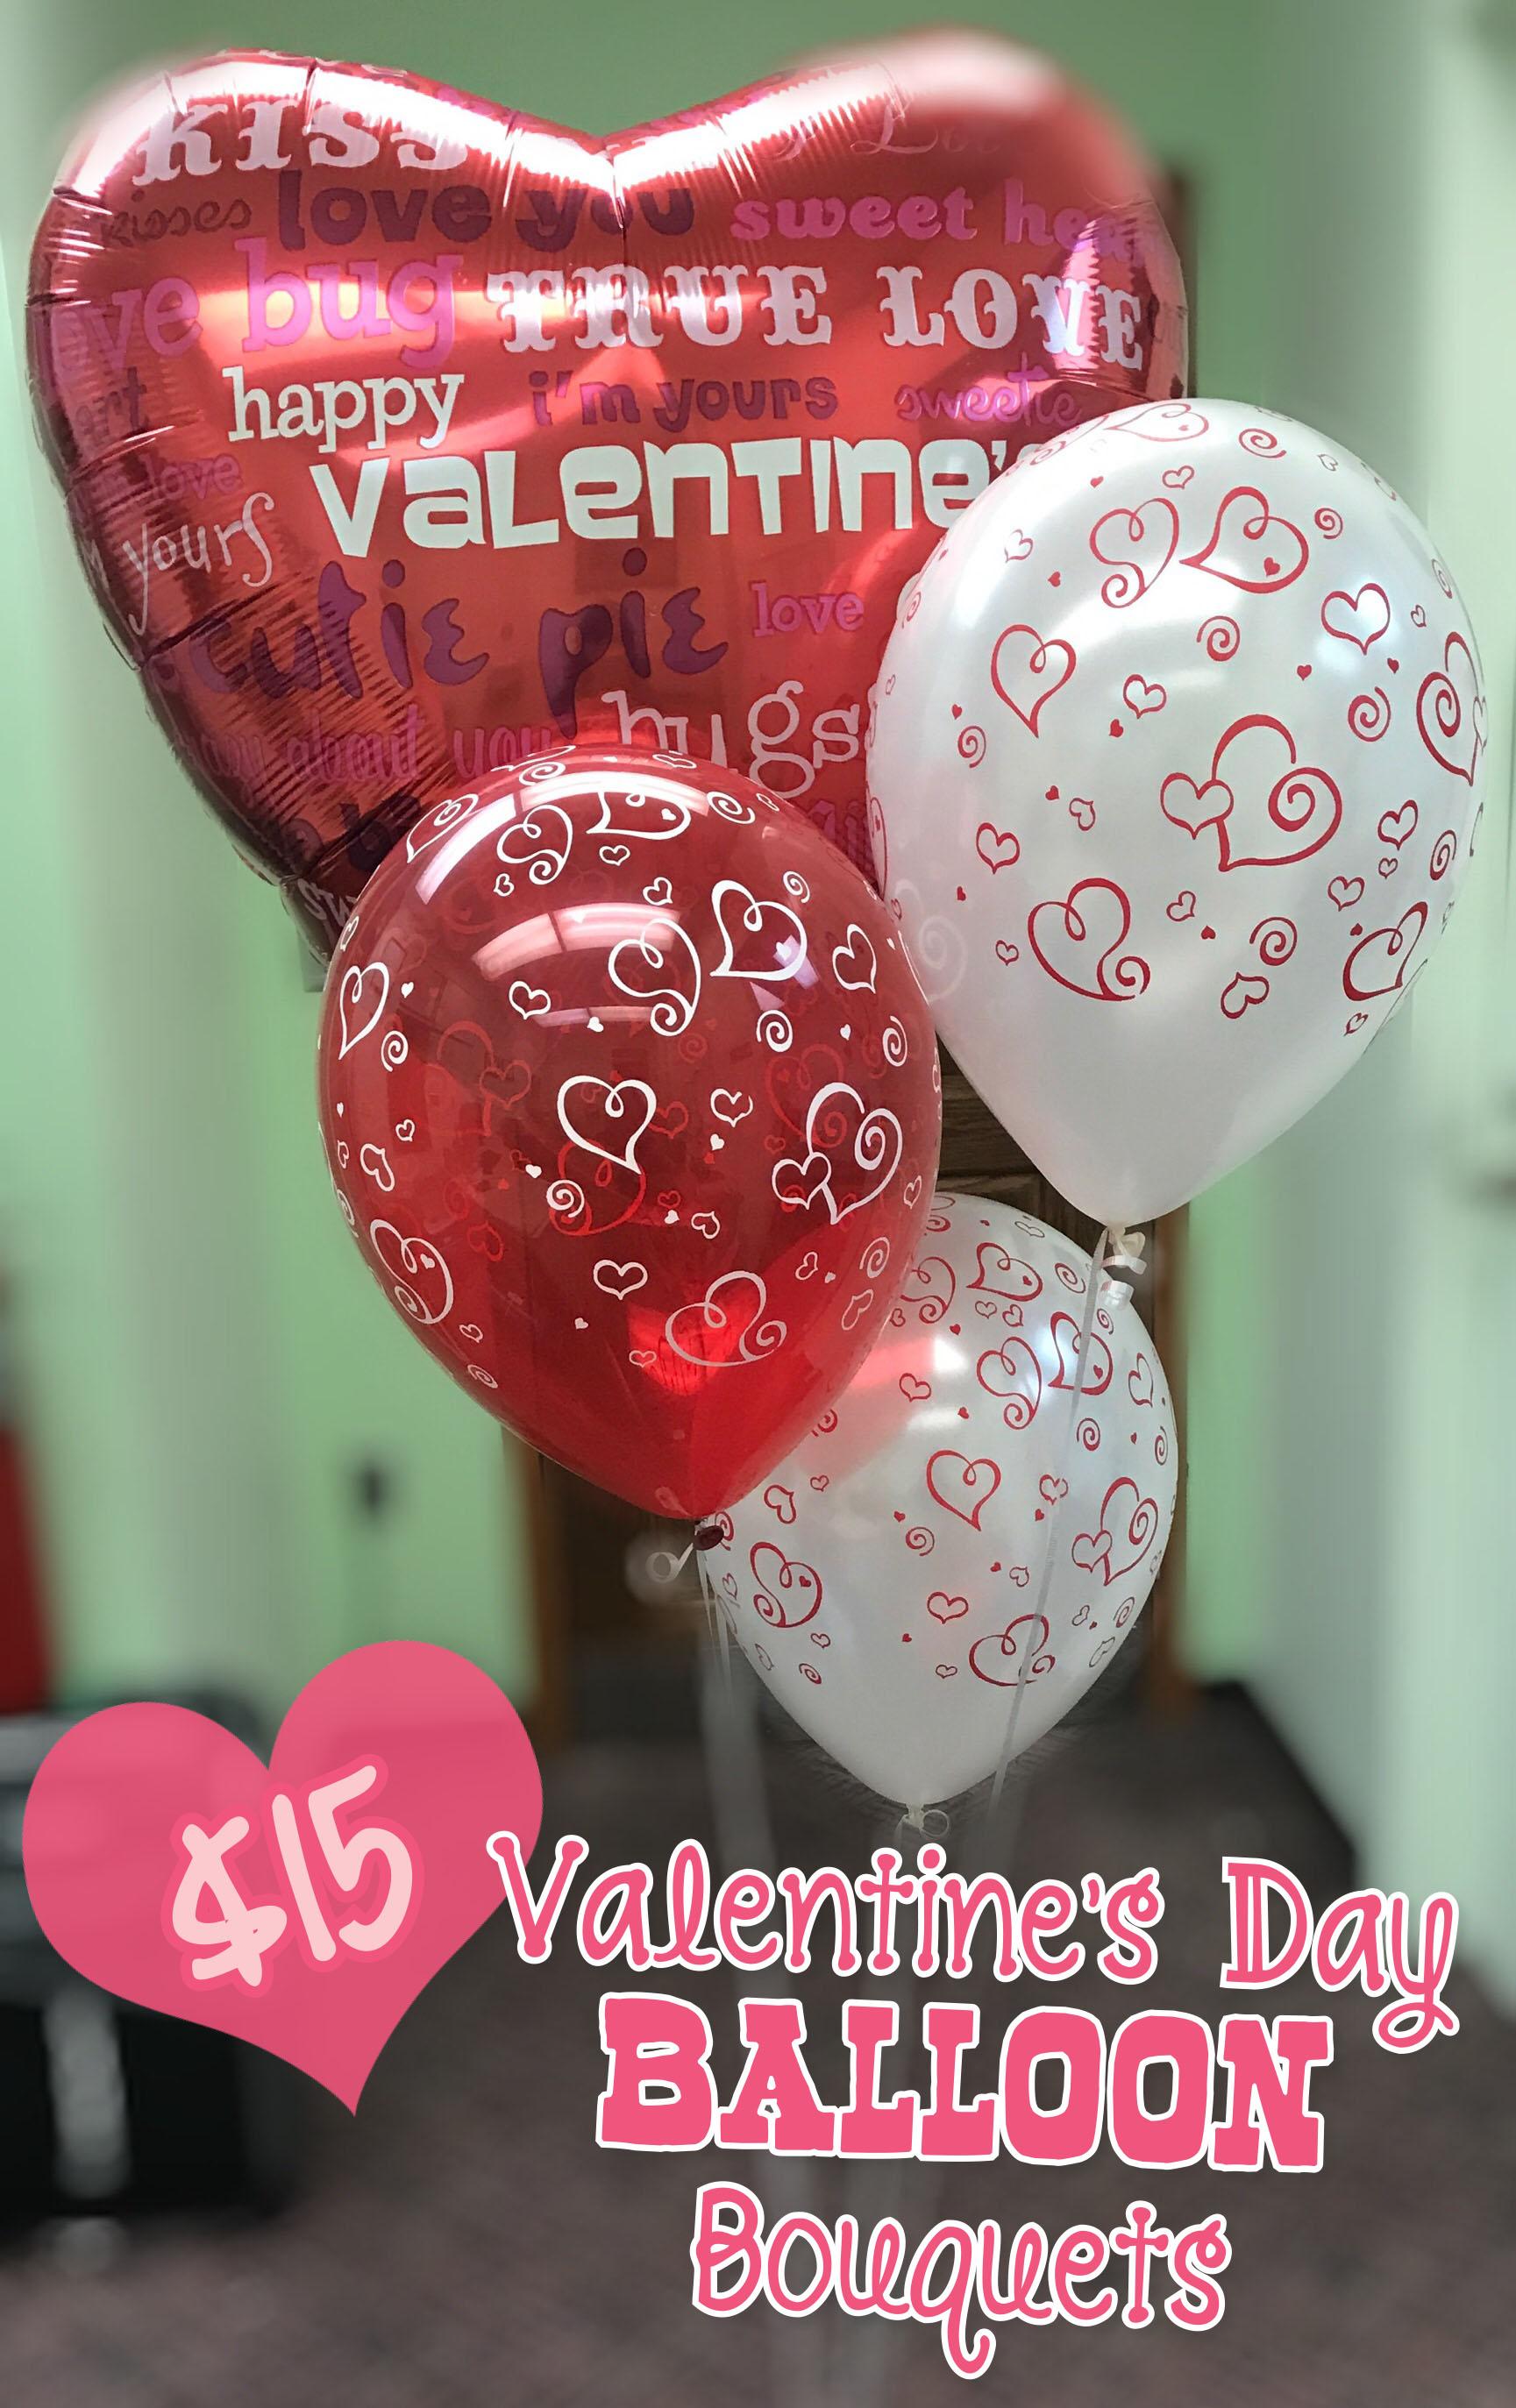 Valentine's Day Balloons.jpg